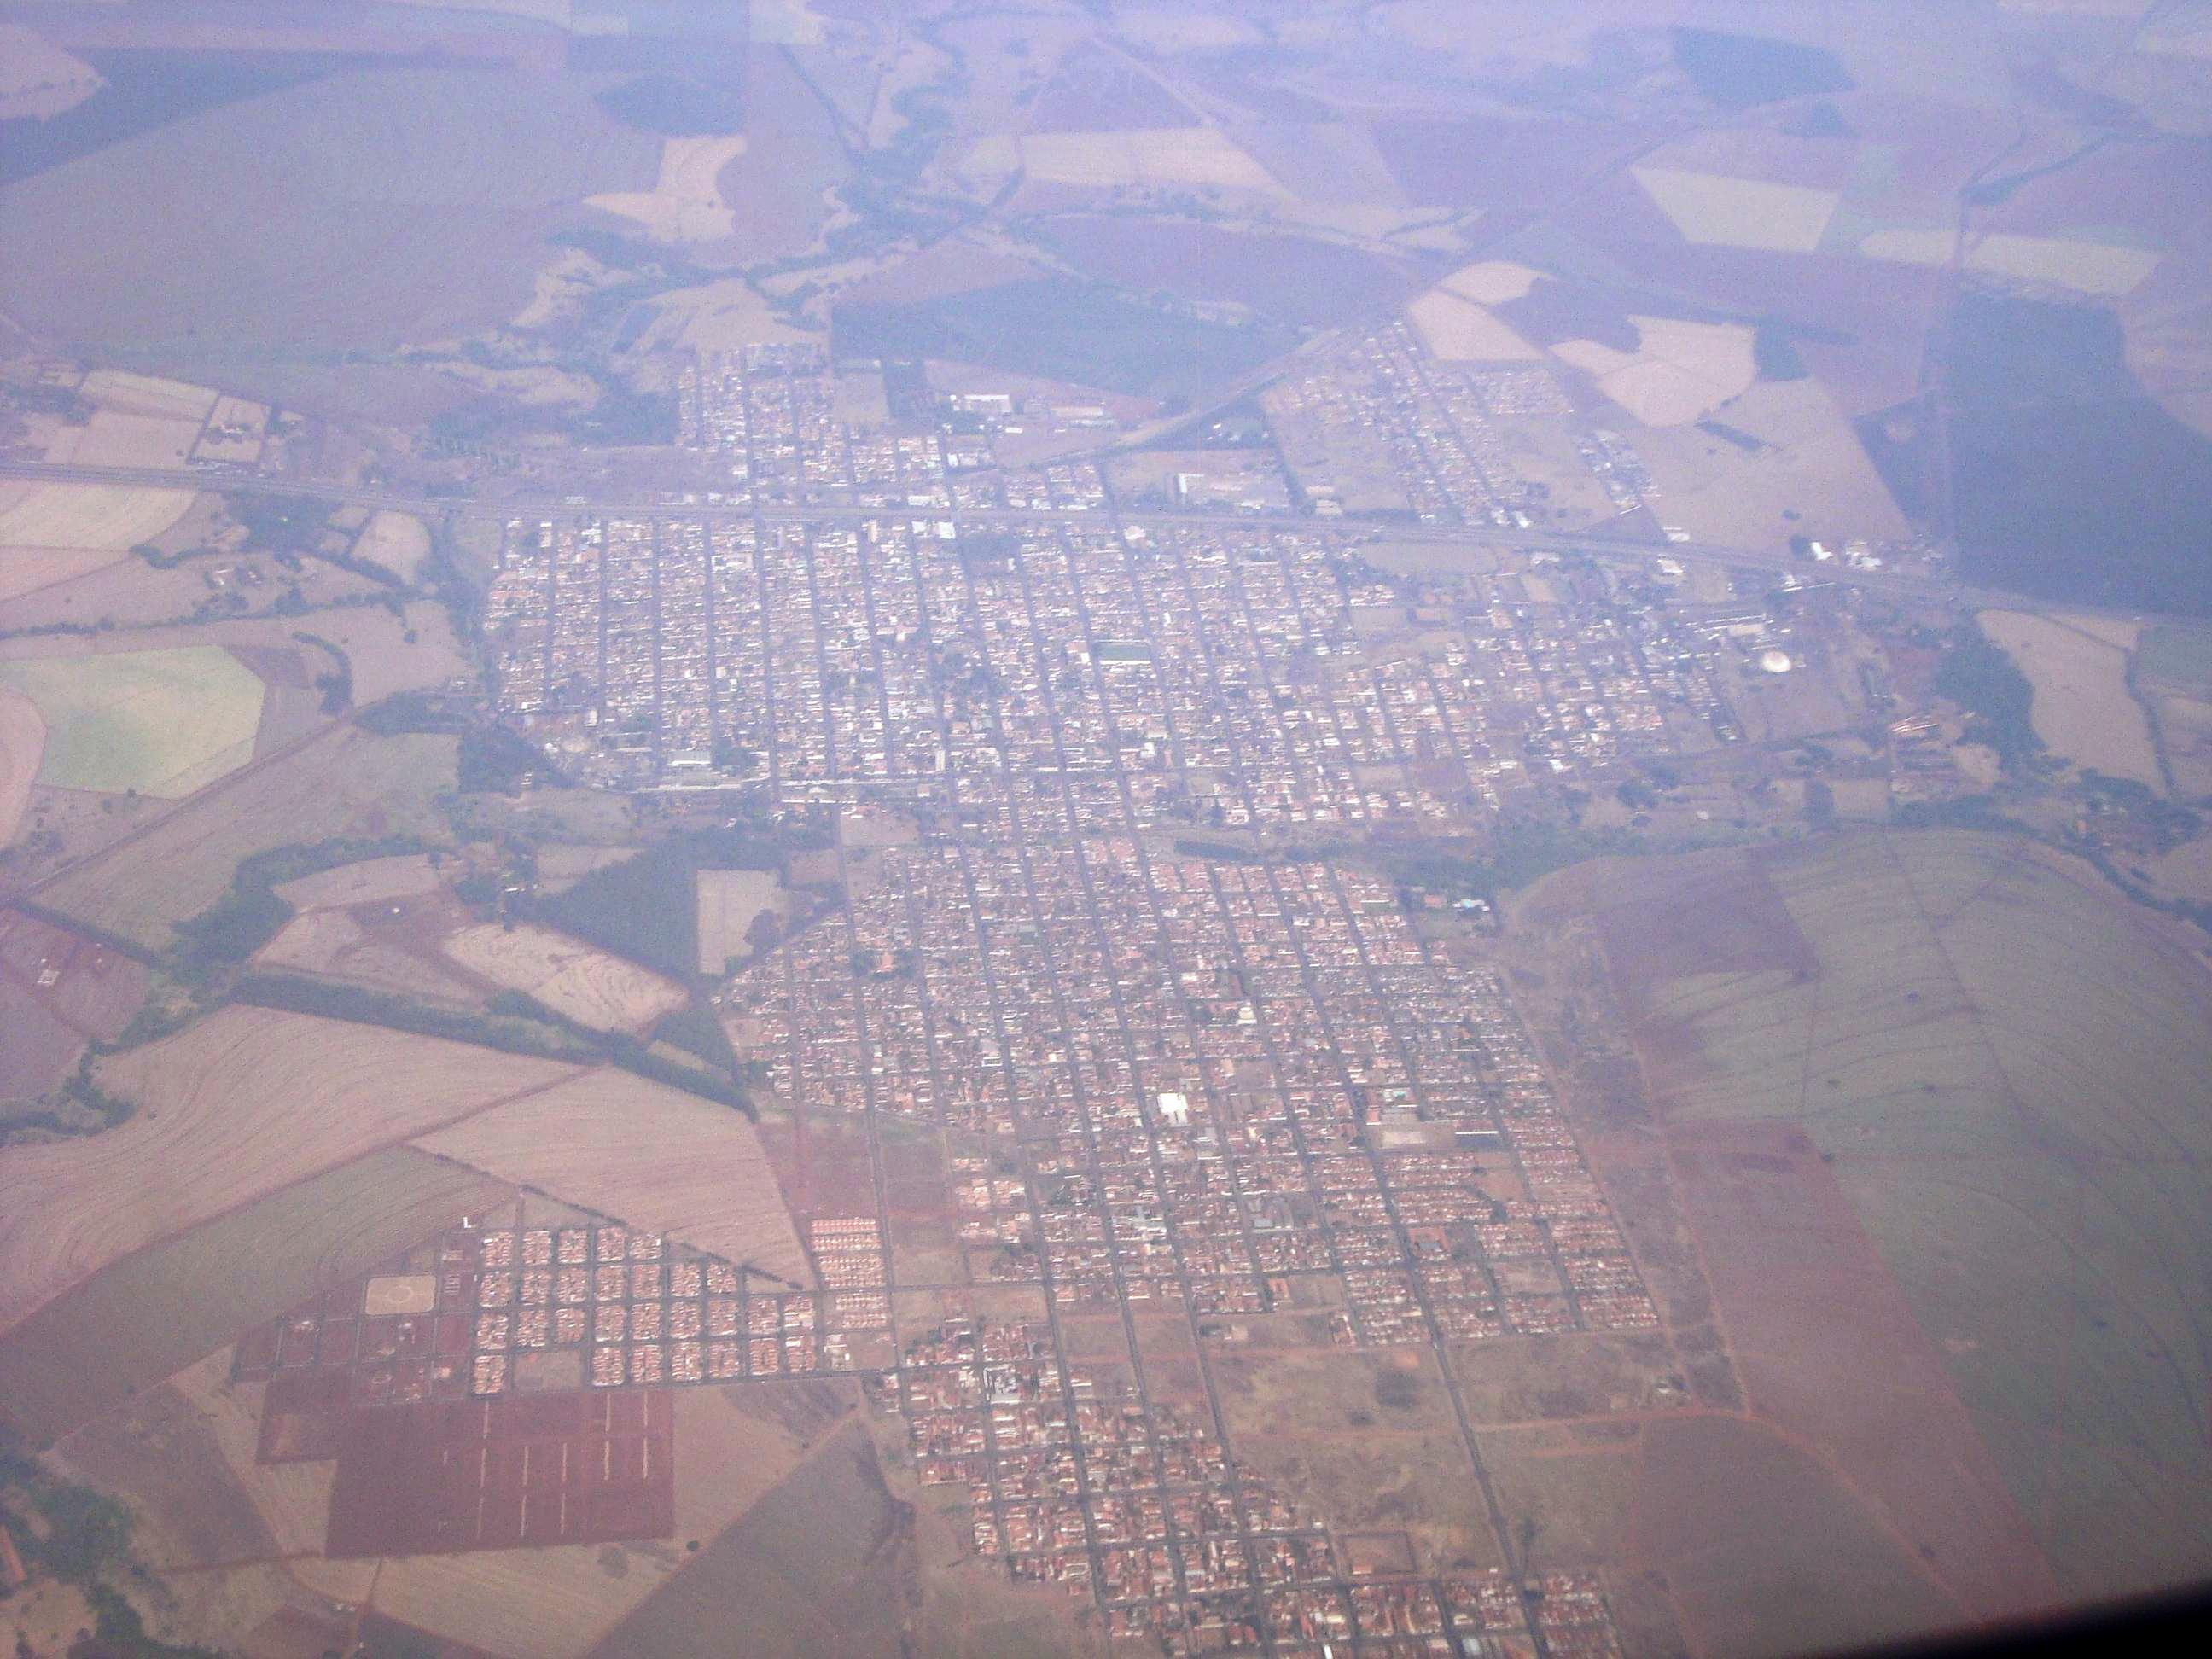 Orlândia São Paulo fonte: upload.wikimedia.org